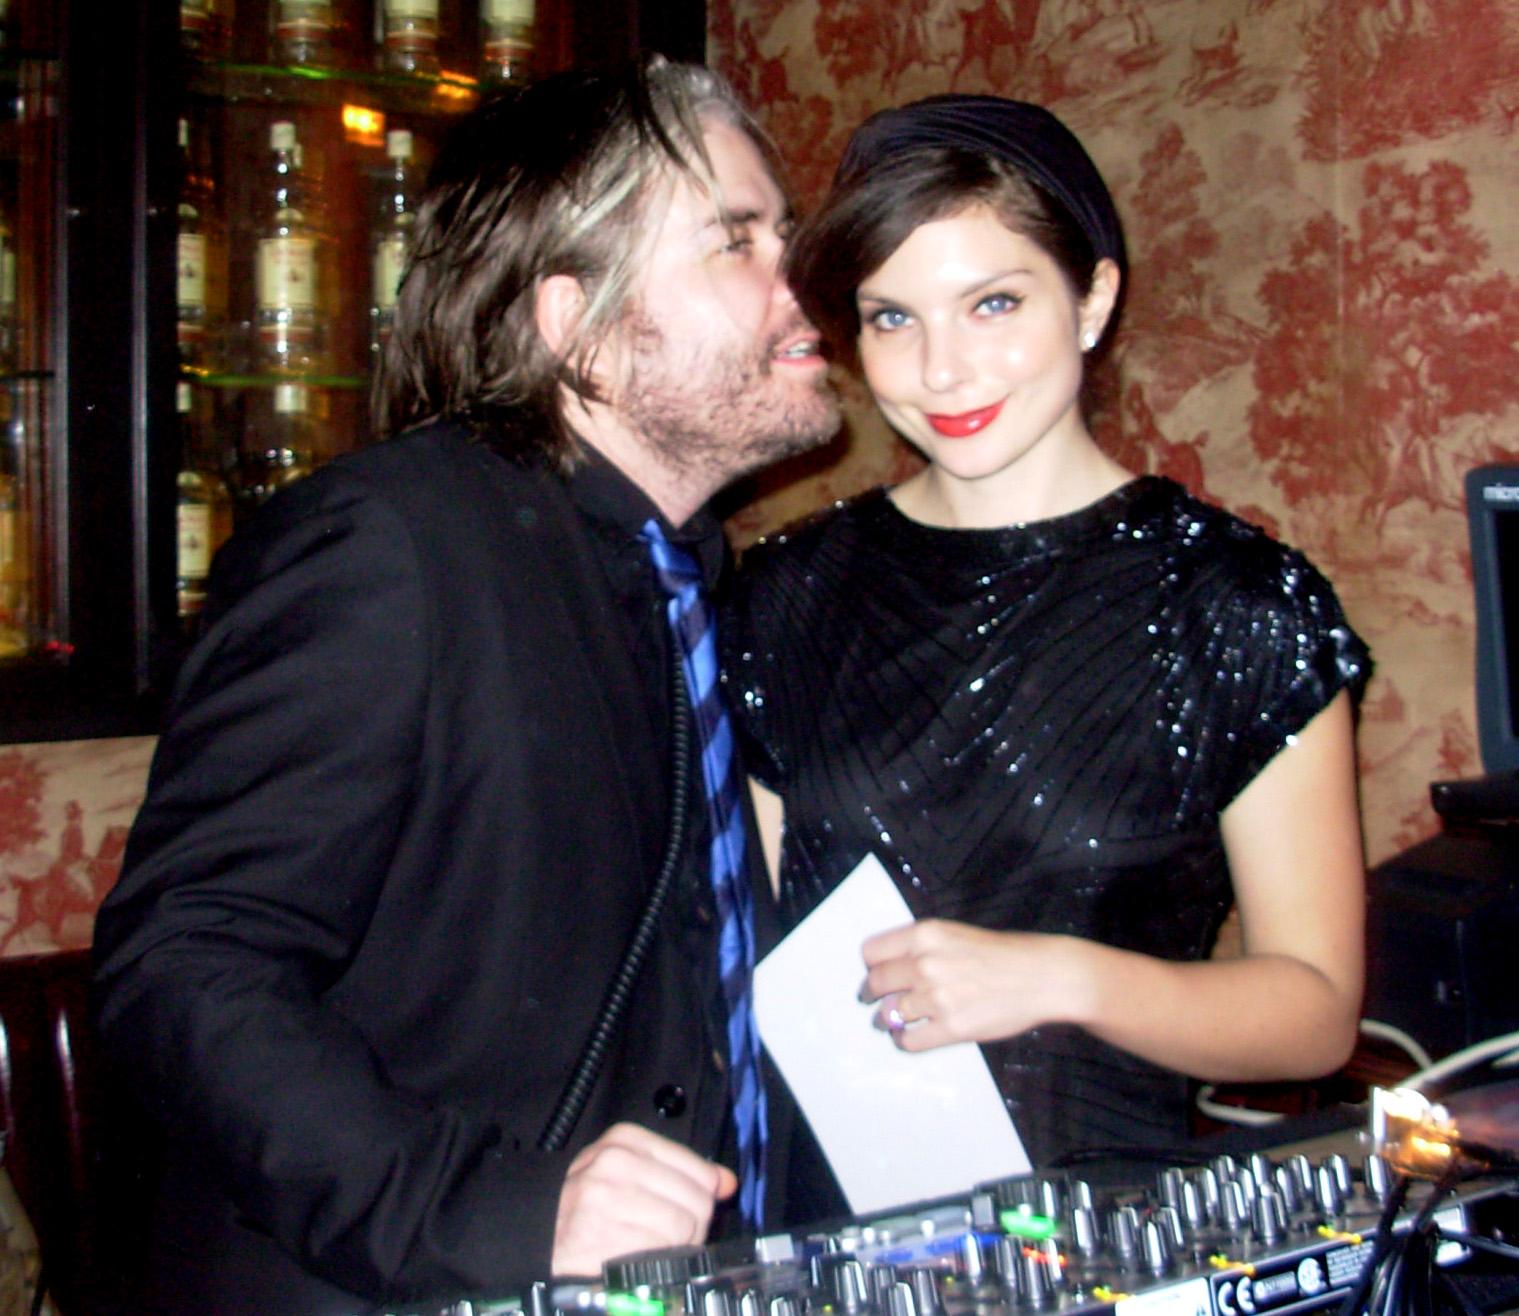 Chris Holmes and Daisy O'Dell